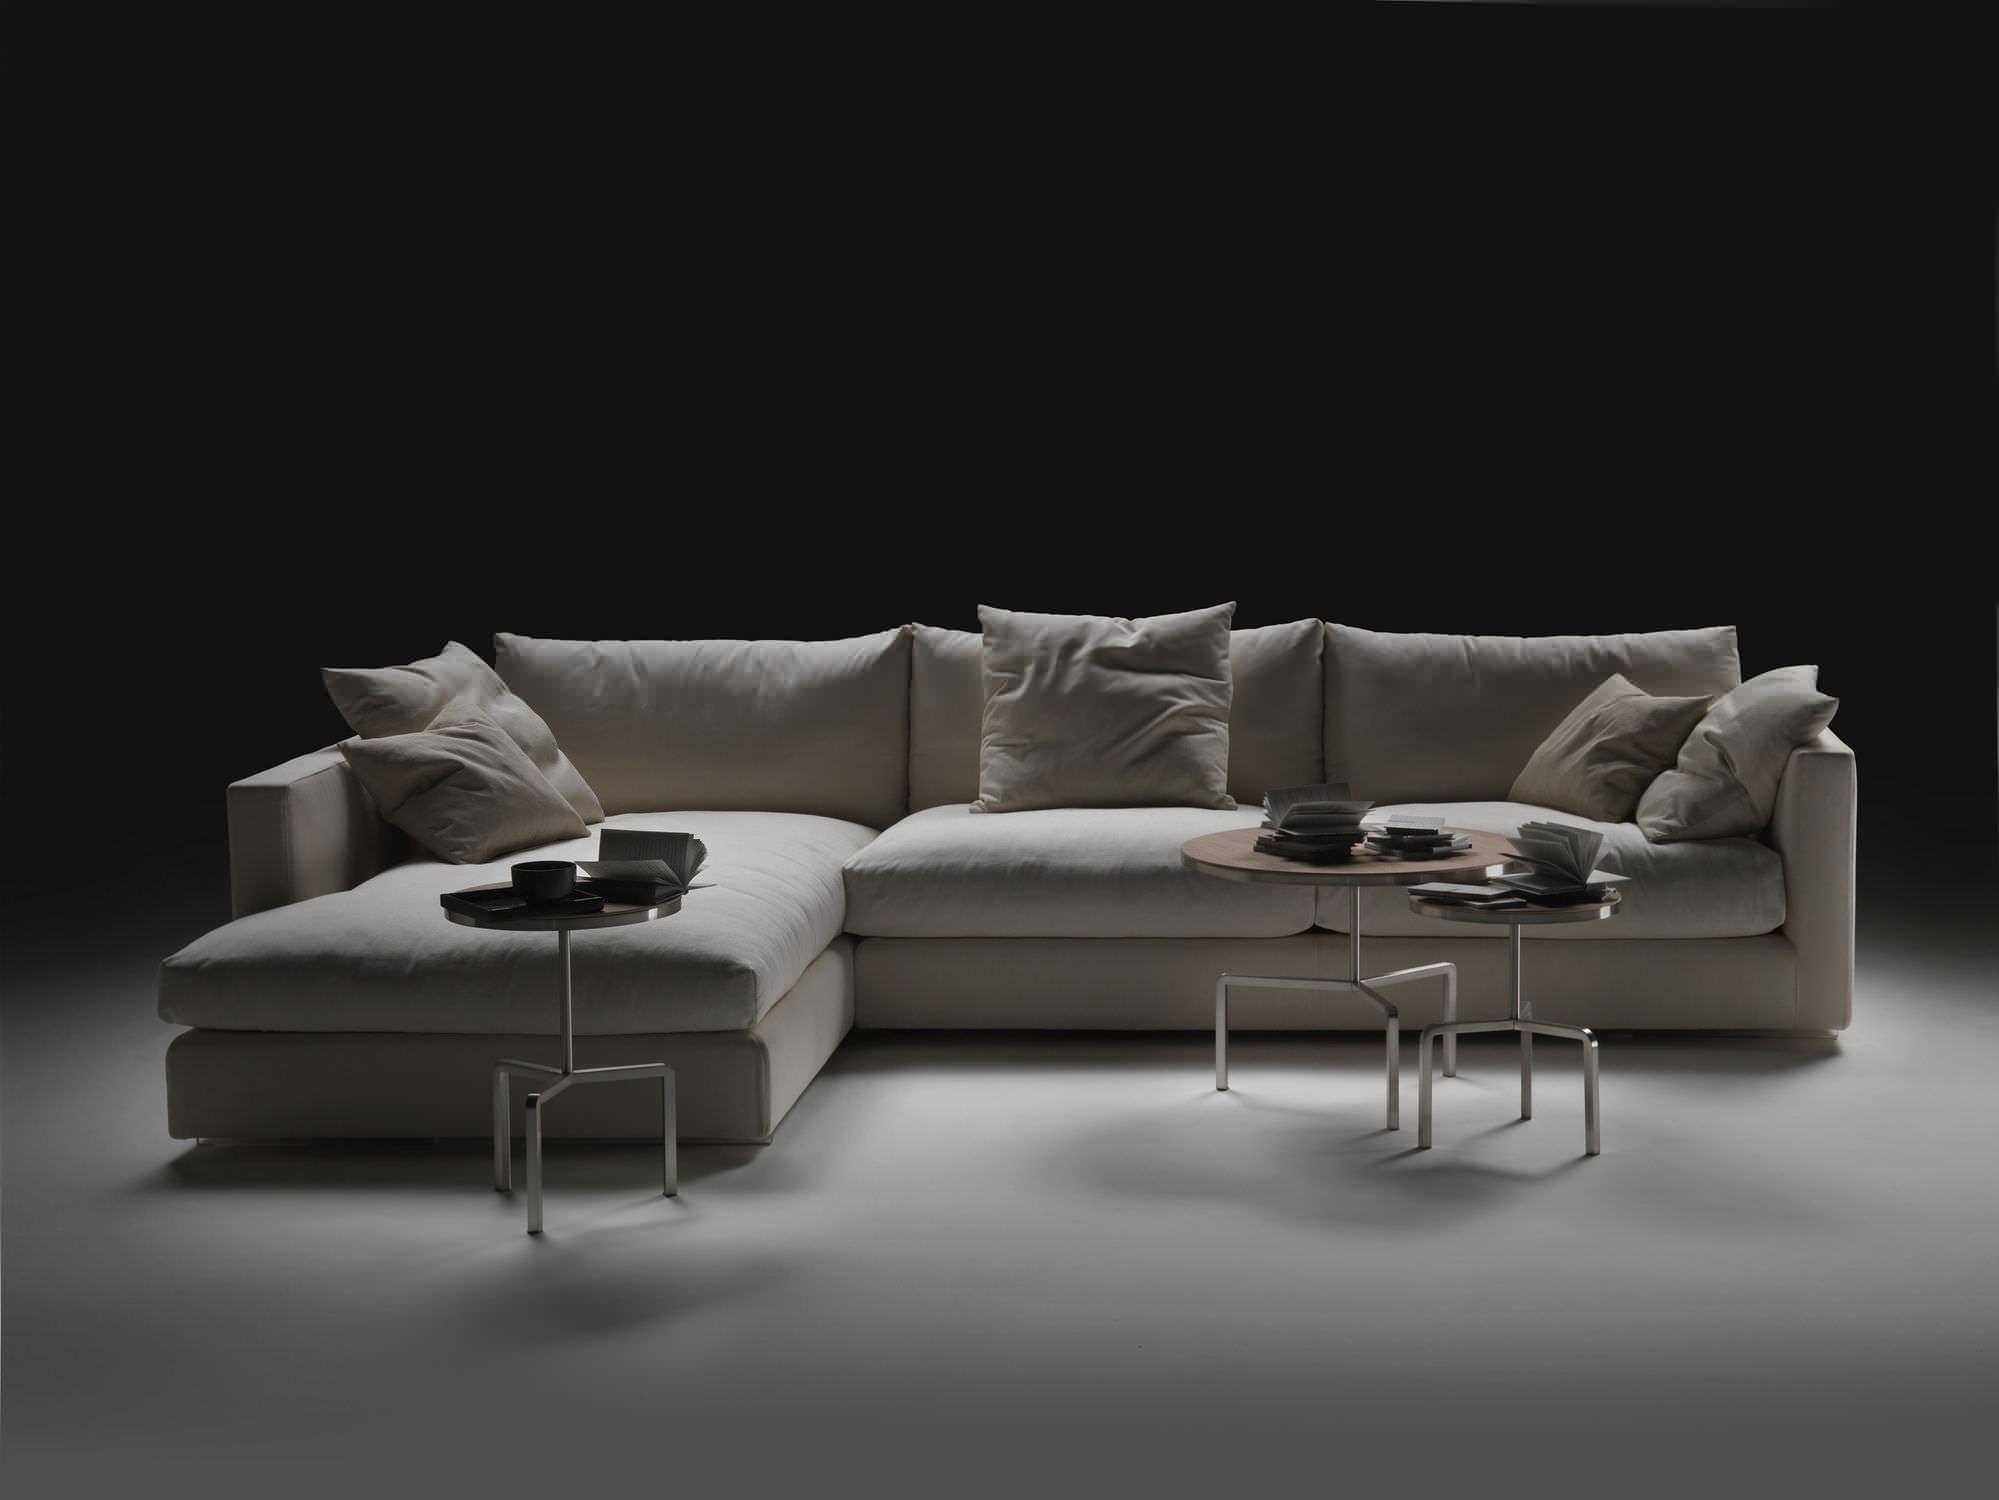 Modular sofa contemporary leather fabric MAGNUM FLEXFORM